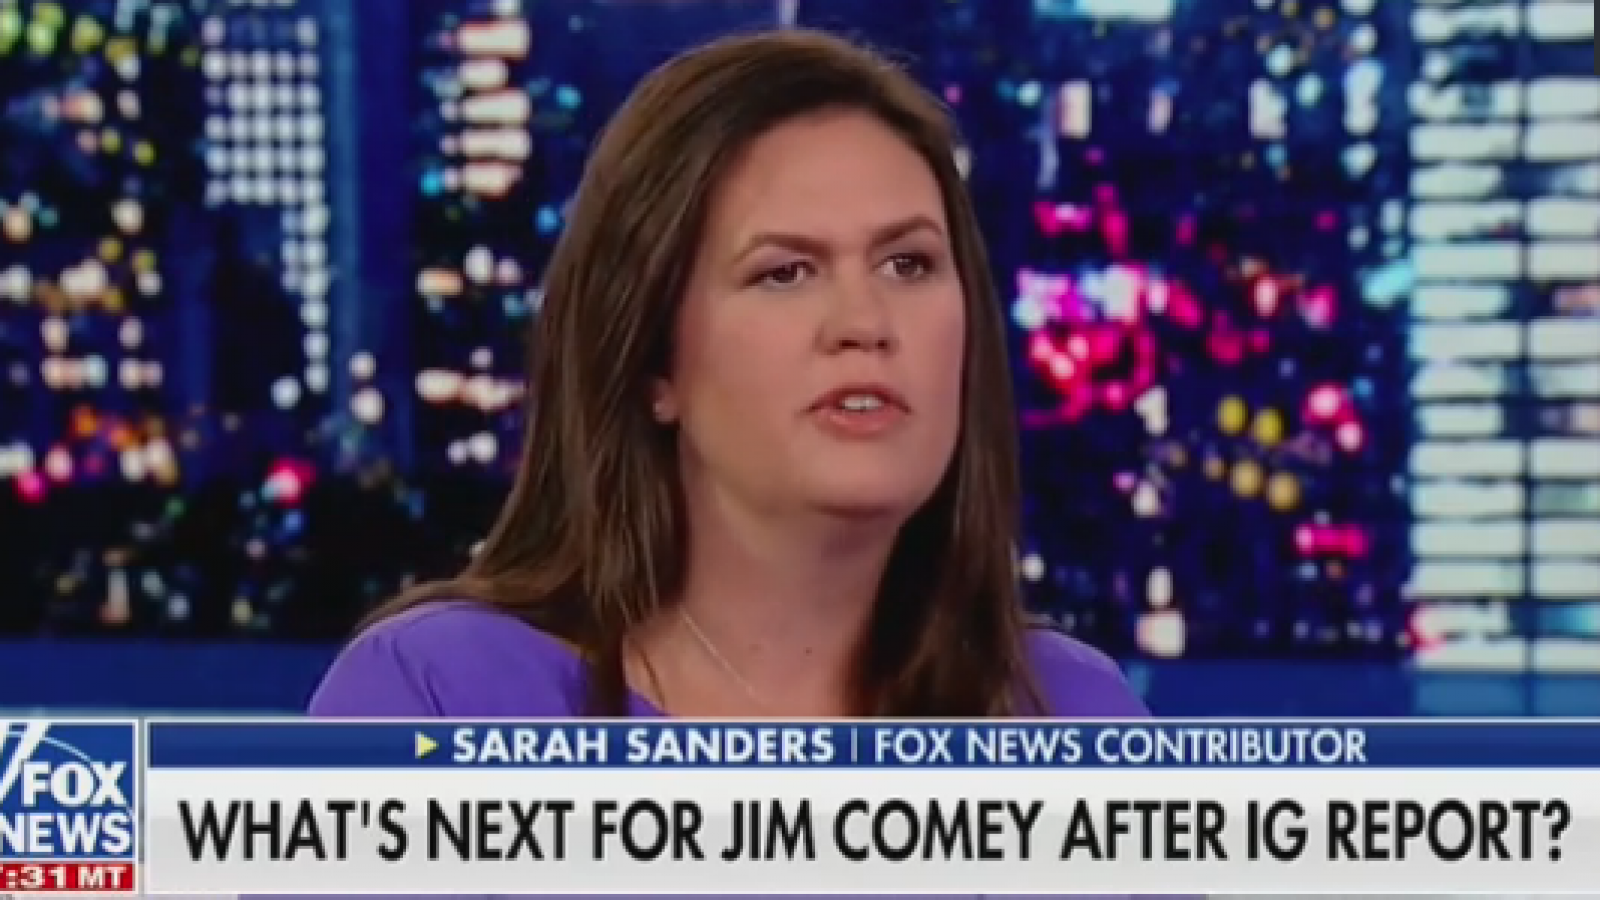 Fox News' Sarah Sanders, Jeanine Pirro Demand James Comey